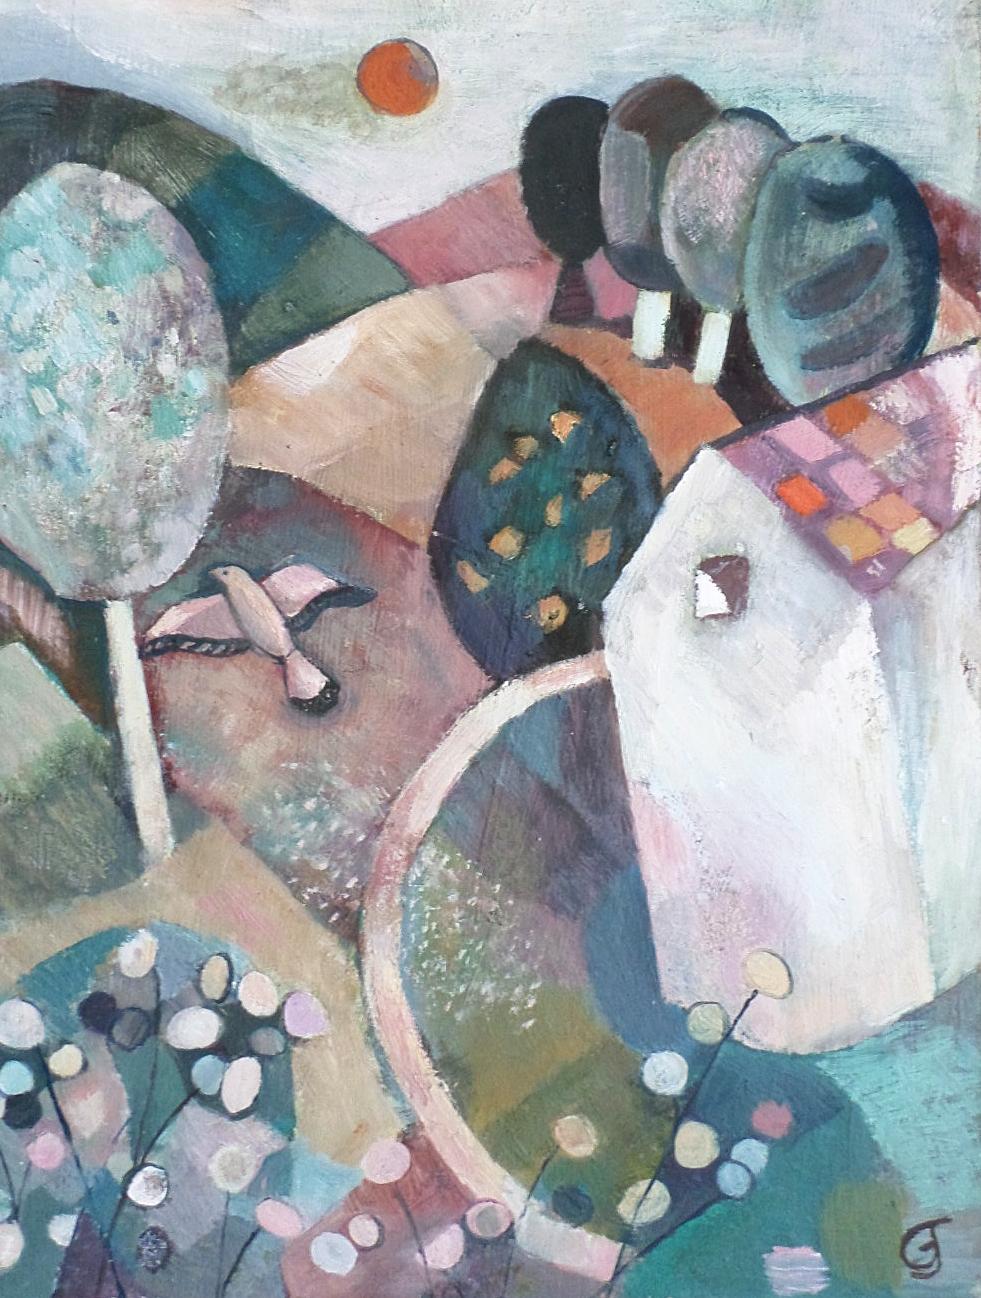 Gwyneth Johnstone painting for sale